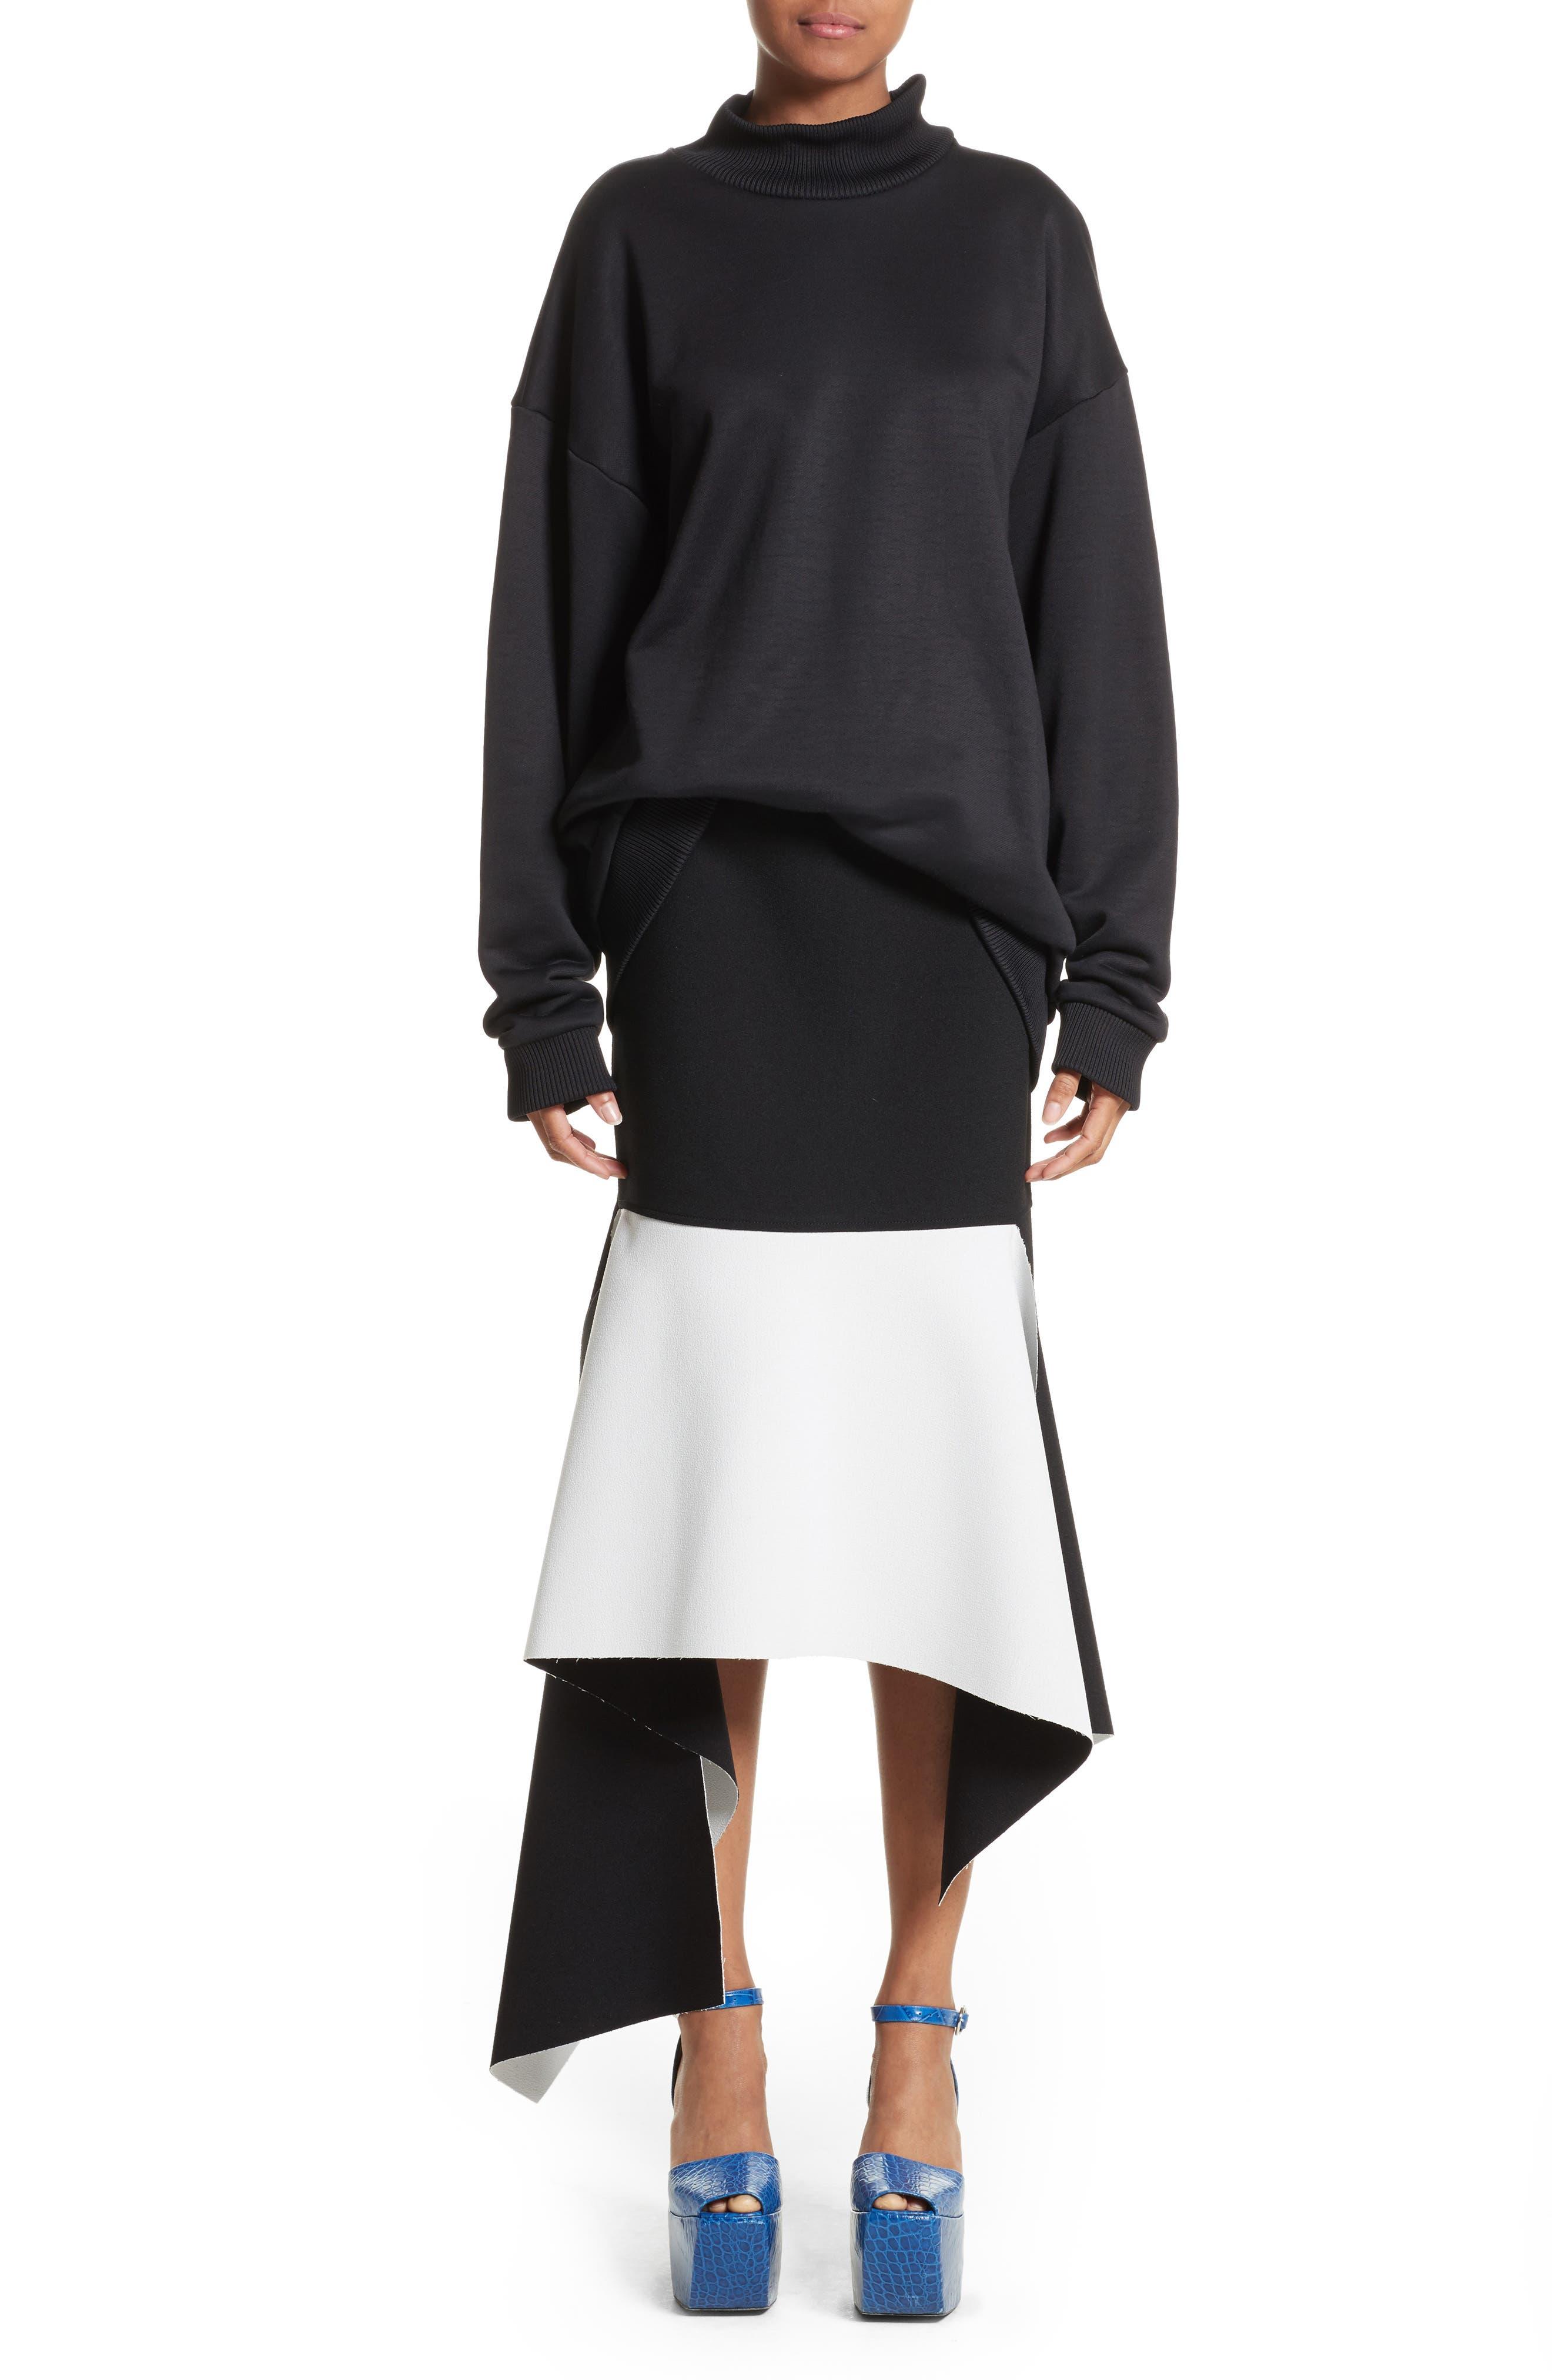 Marques'Almeida Asymmetrical Bicolor Crepe Skirt,                             Alternate thumbnail 7, color,                             003